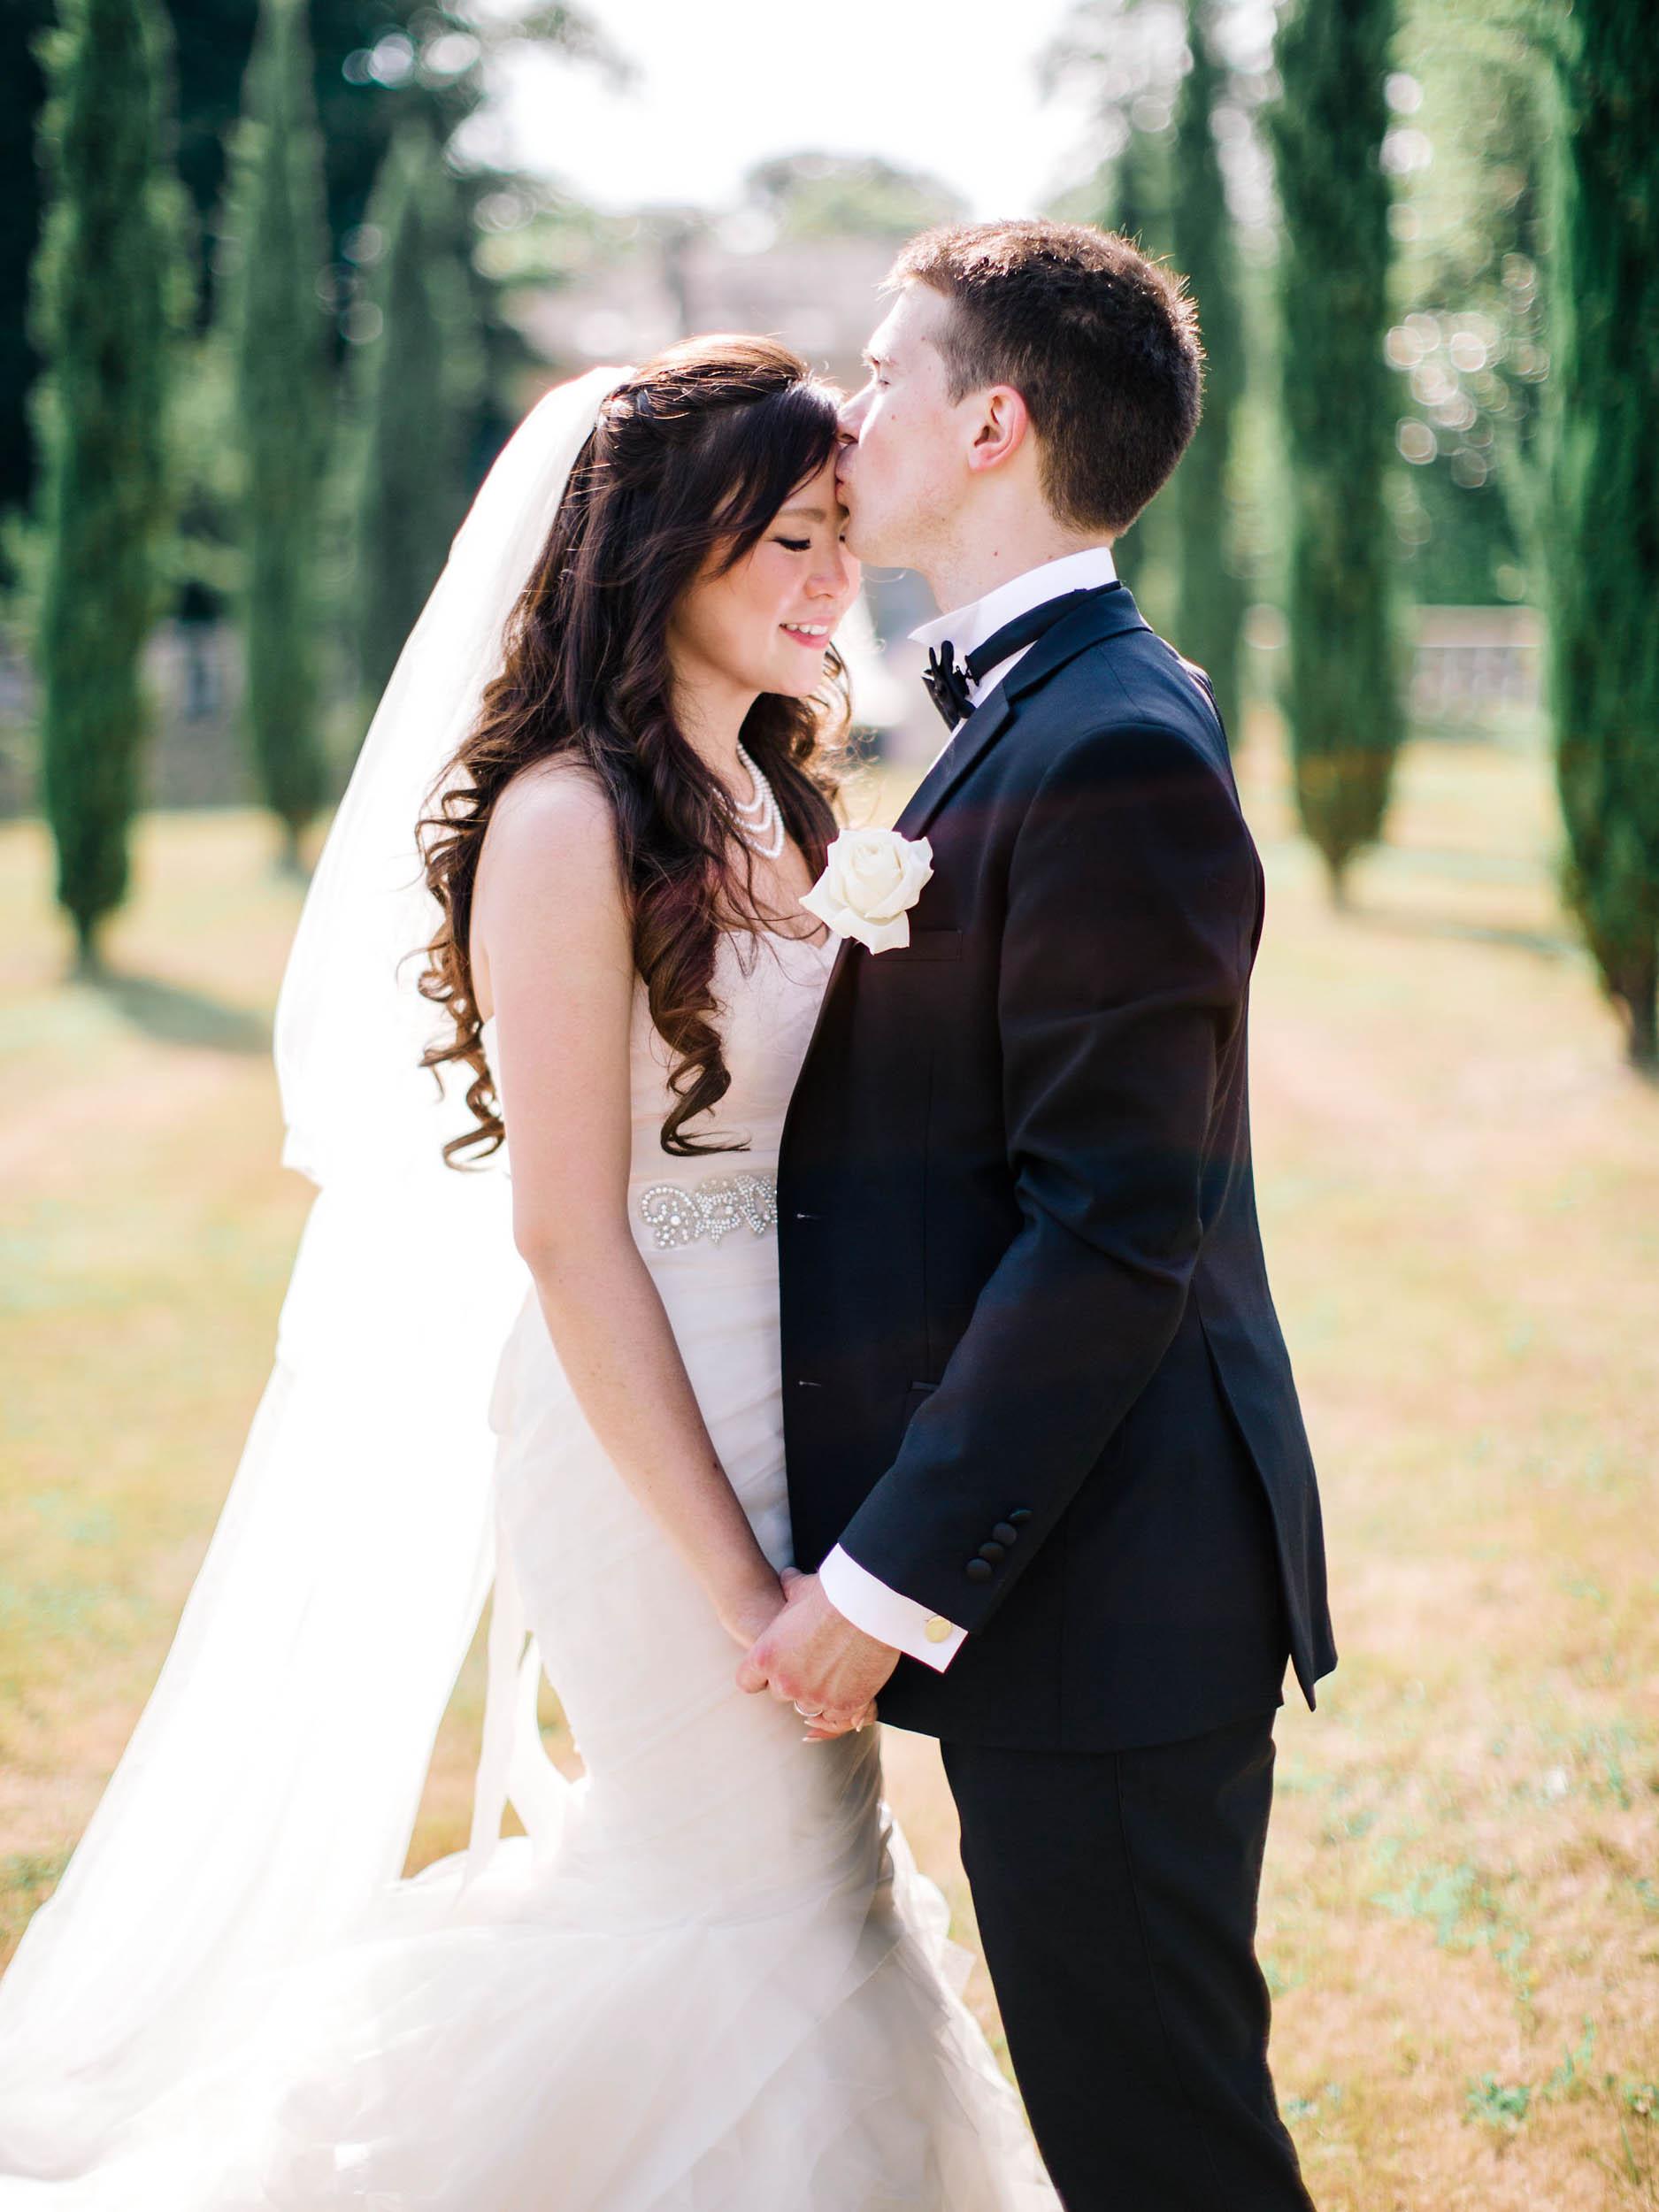 Amy O'Boyle Photography- Destination & UK Fine Art Film Wedding Photographer- Chateau La Durantie Wedding-43.jpg